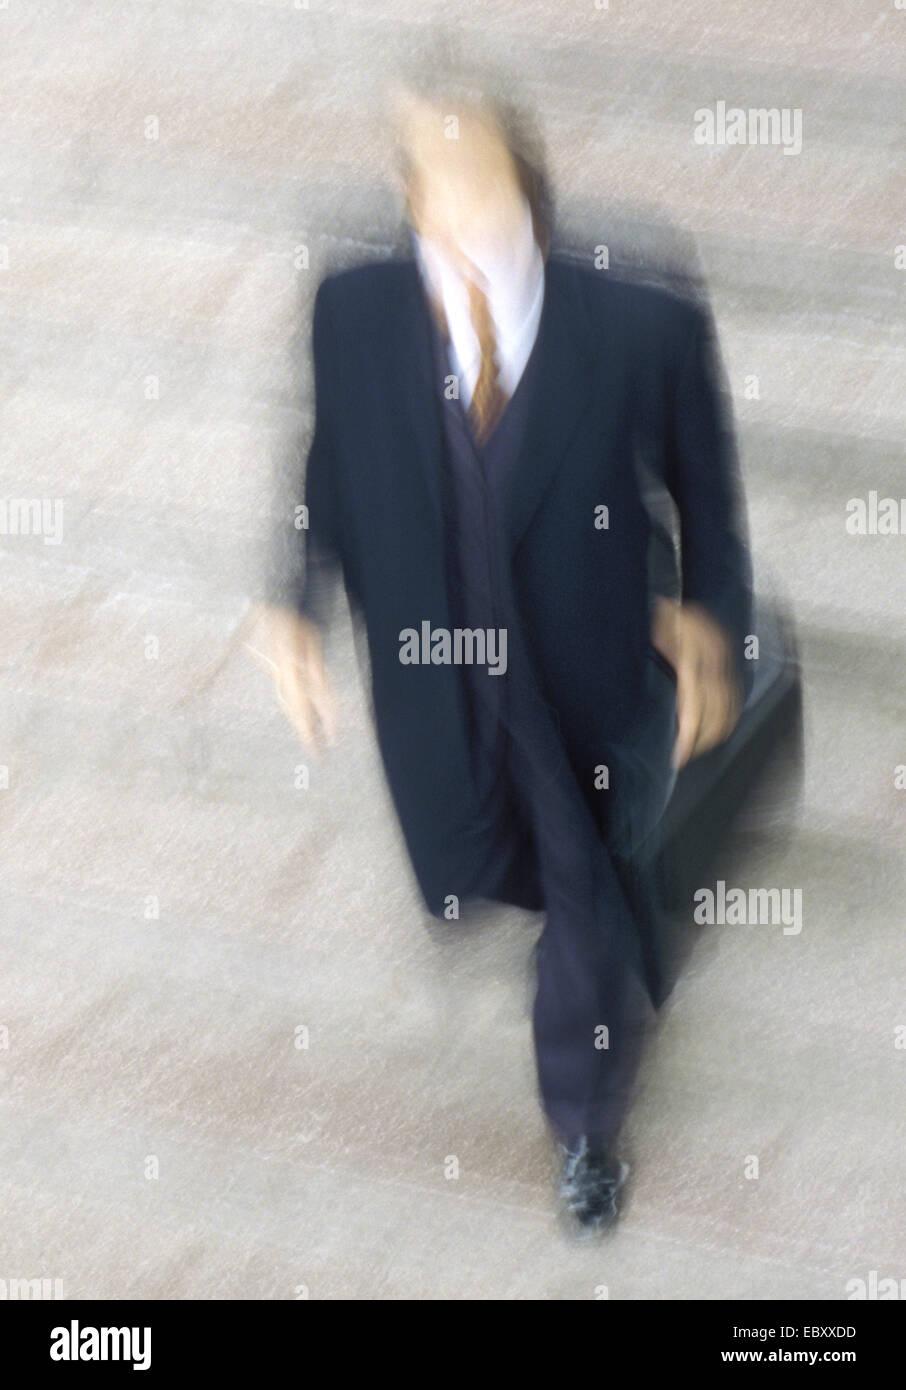 Mann zu Fuß, bewegte Unschärfe Stockbild